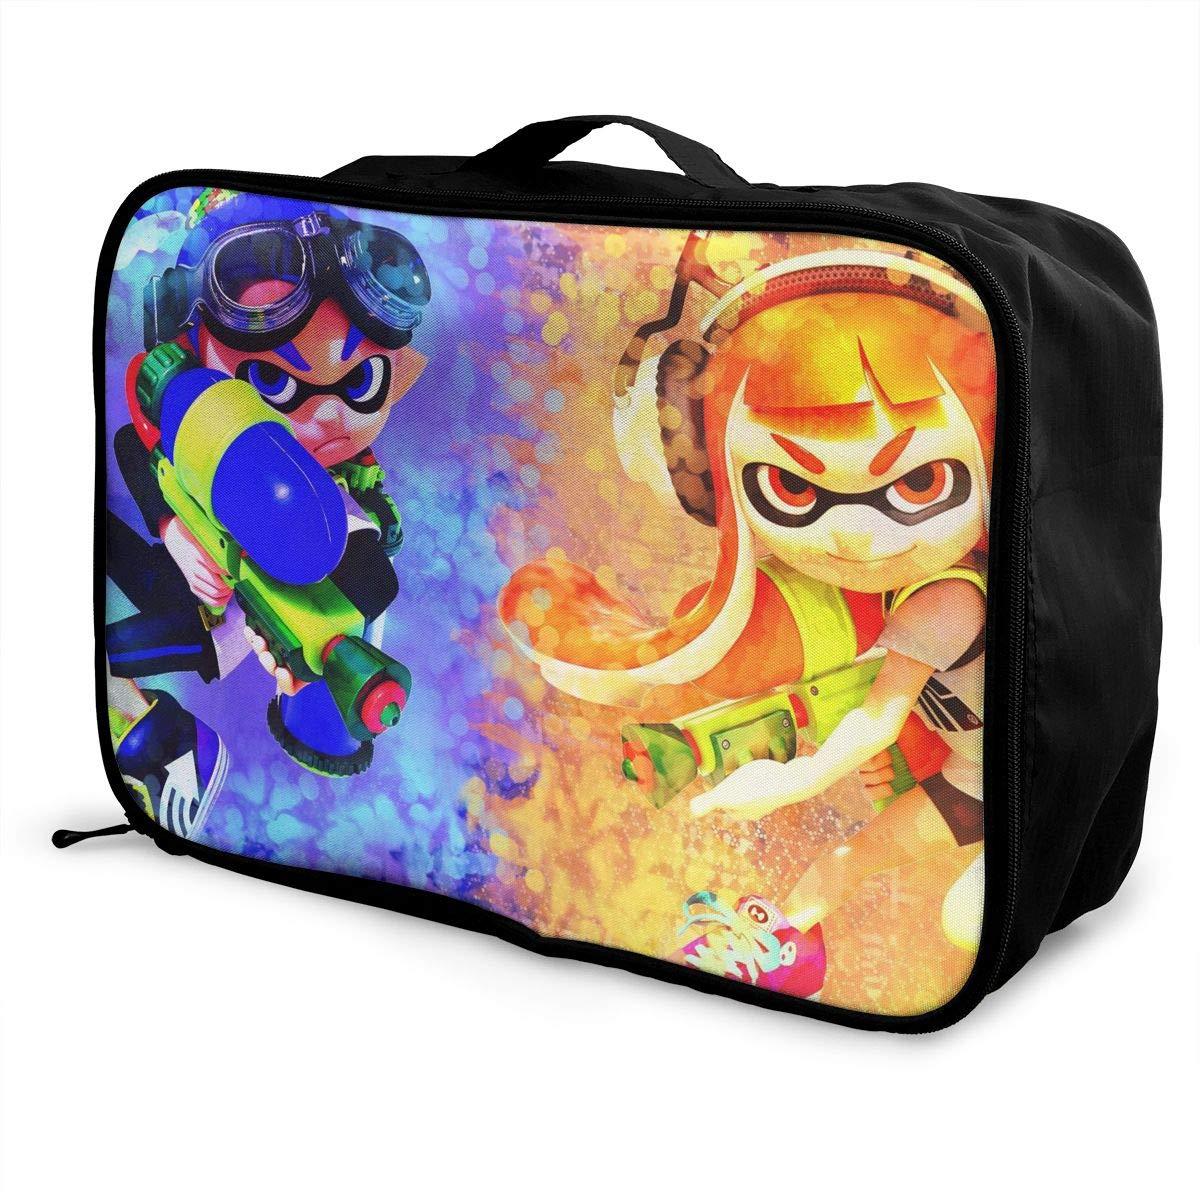 BOKAIKAI1306 Handsome S-Splatoon Unisex Adult Fashion Lightweight Large Capacity Portable Large Travel Duffel Bag Men Woman Luggage Bag 3D Pattern Customized Boarding Box